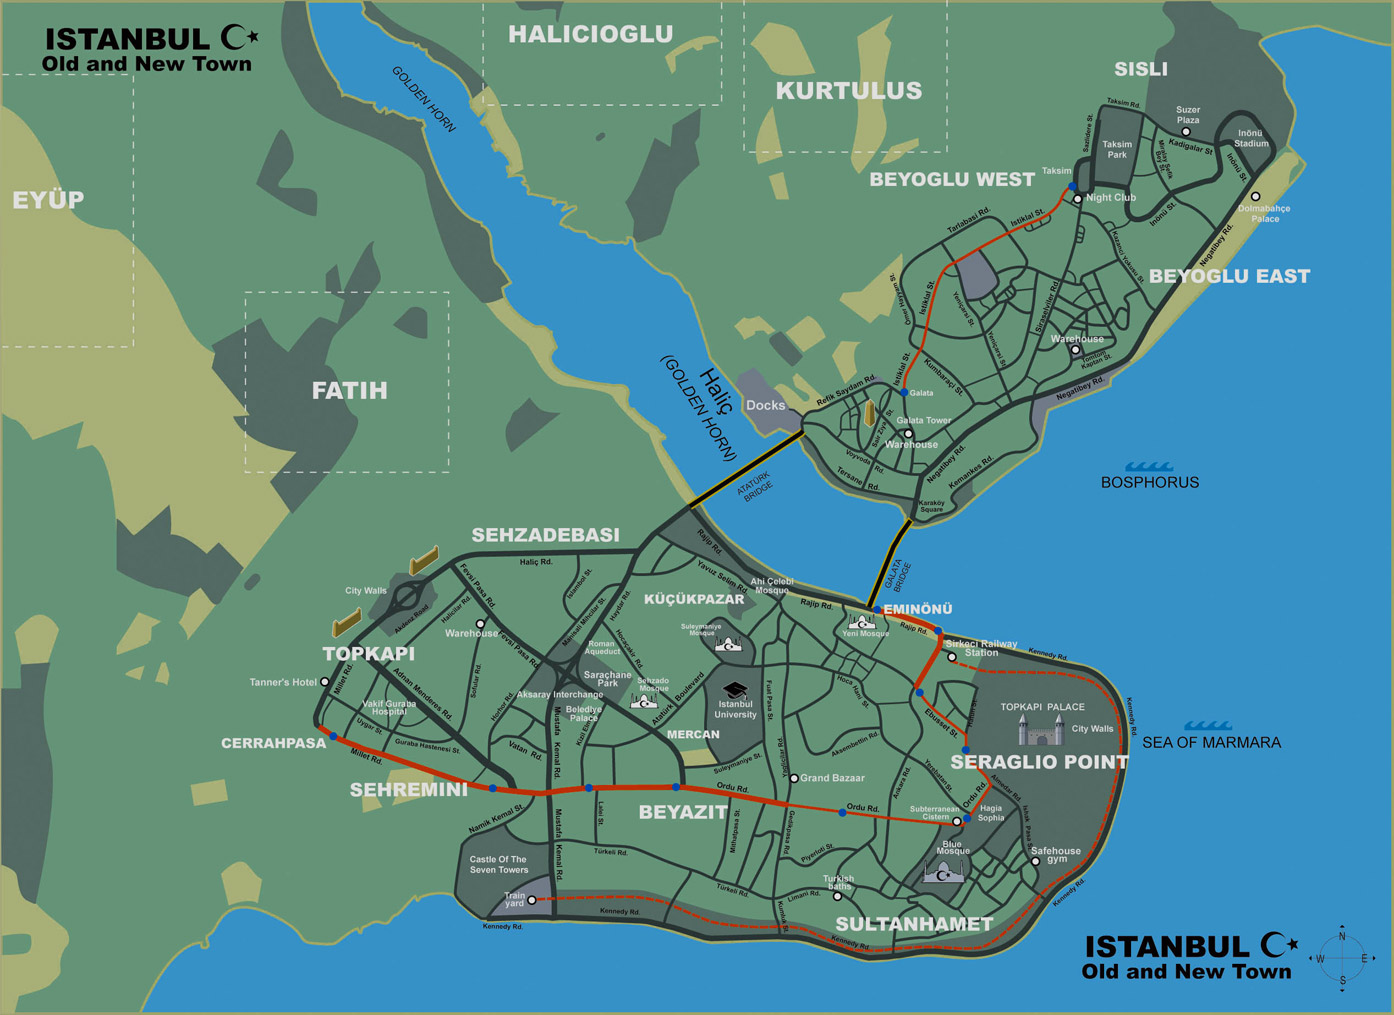 Istanbul, Turkey | DRIV3R Wiki | FANDOM powered by Wikia on jerusalem map, baghdad map, naples italy map, turkey map, black sea map, moscow map, novorossiysk map, romania map, oslo map, madrid map, casablanca map, constantinople map, dardanelles map, kabul map, mediterranean sea map, dubai map, tehran map, ottoman empire map, cordoba map, ankara map,